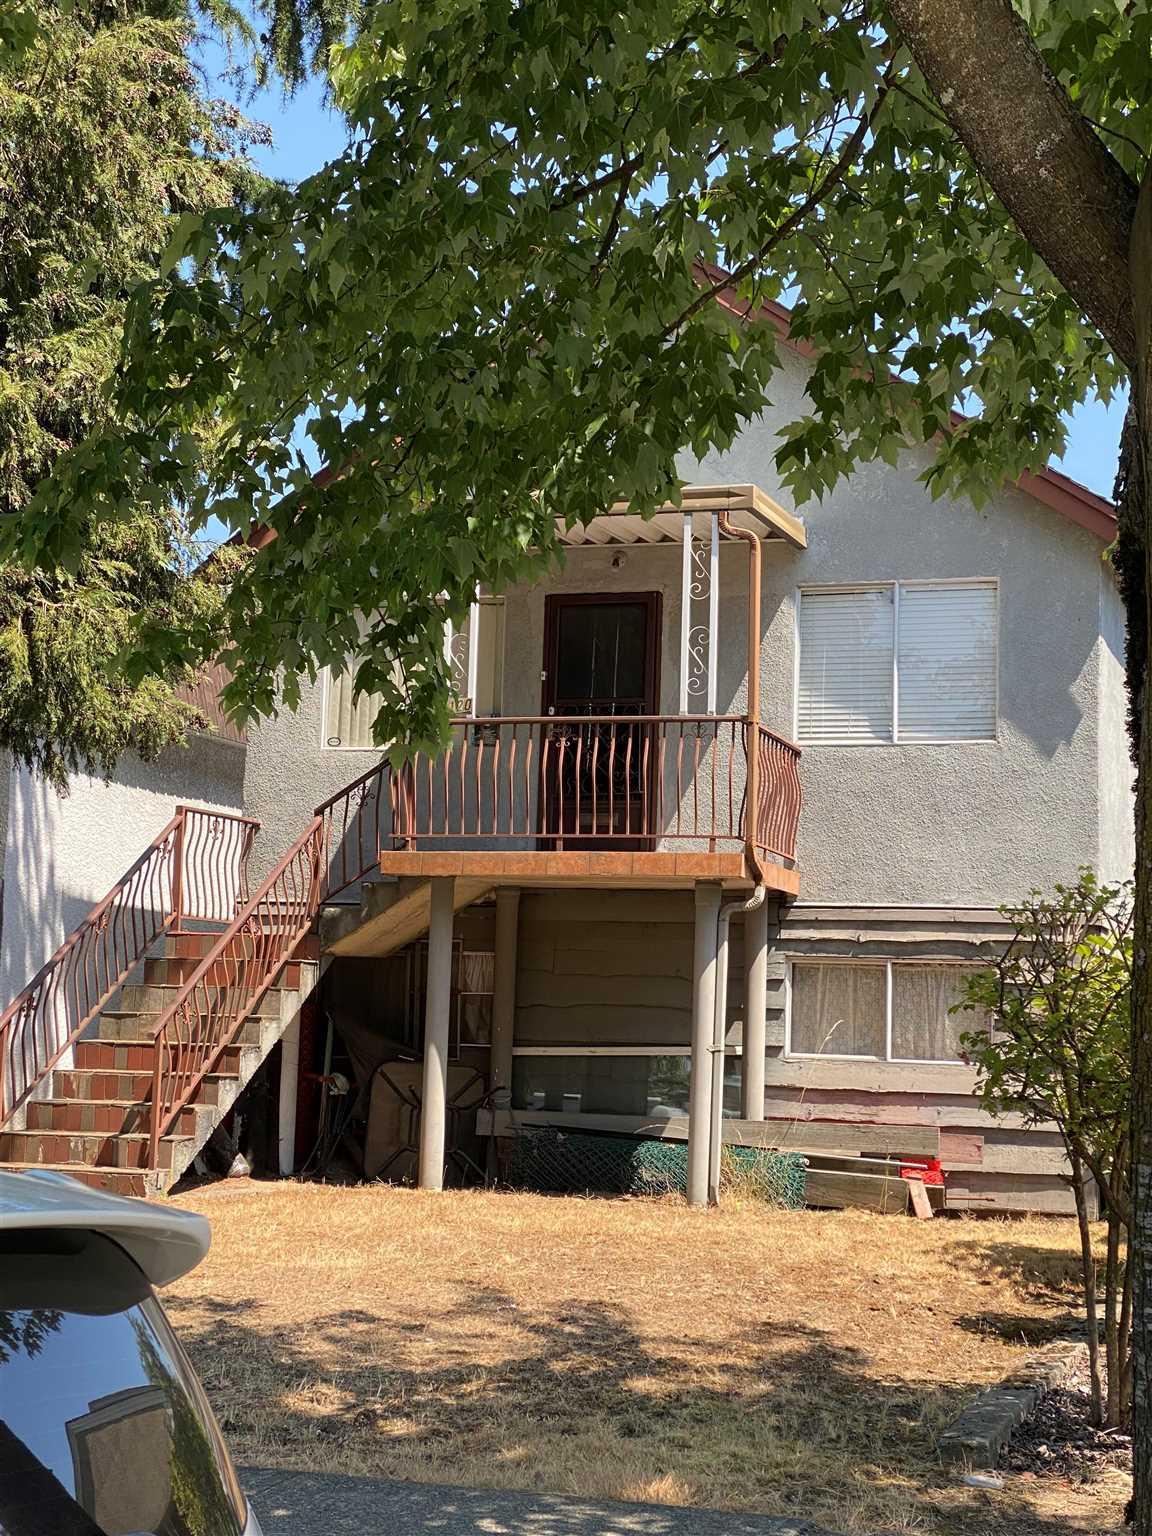 2120 NANAIMO STREET - Renfrew VE House/Single Family for sale, 4 Bedrooms (R2602343) - #1